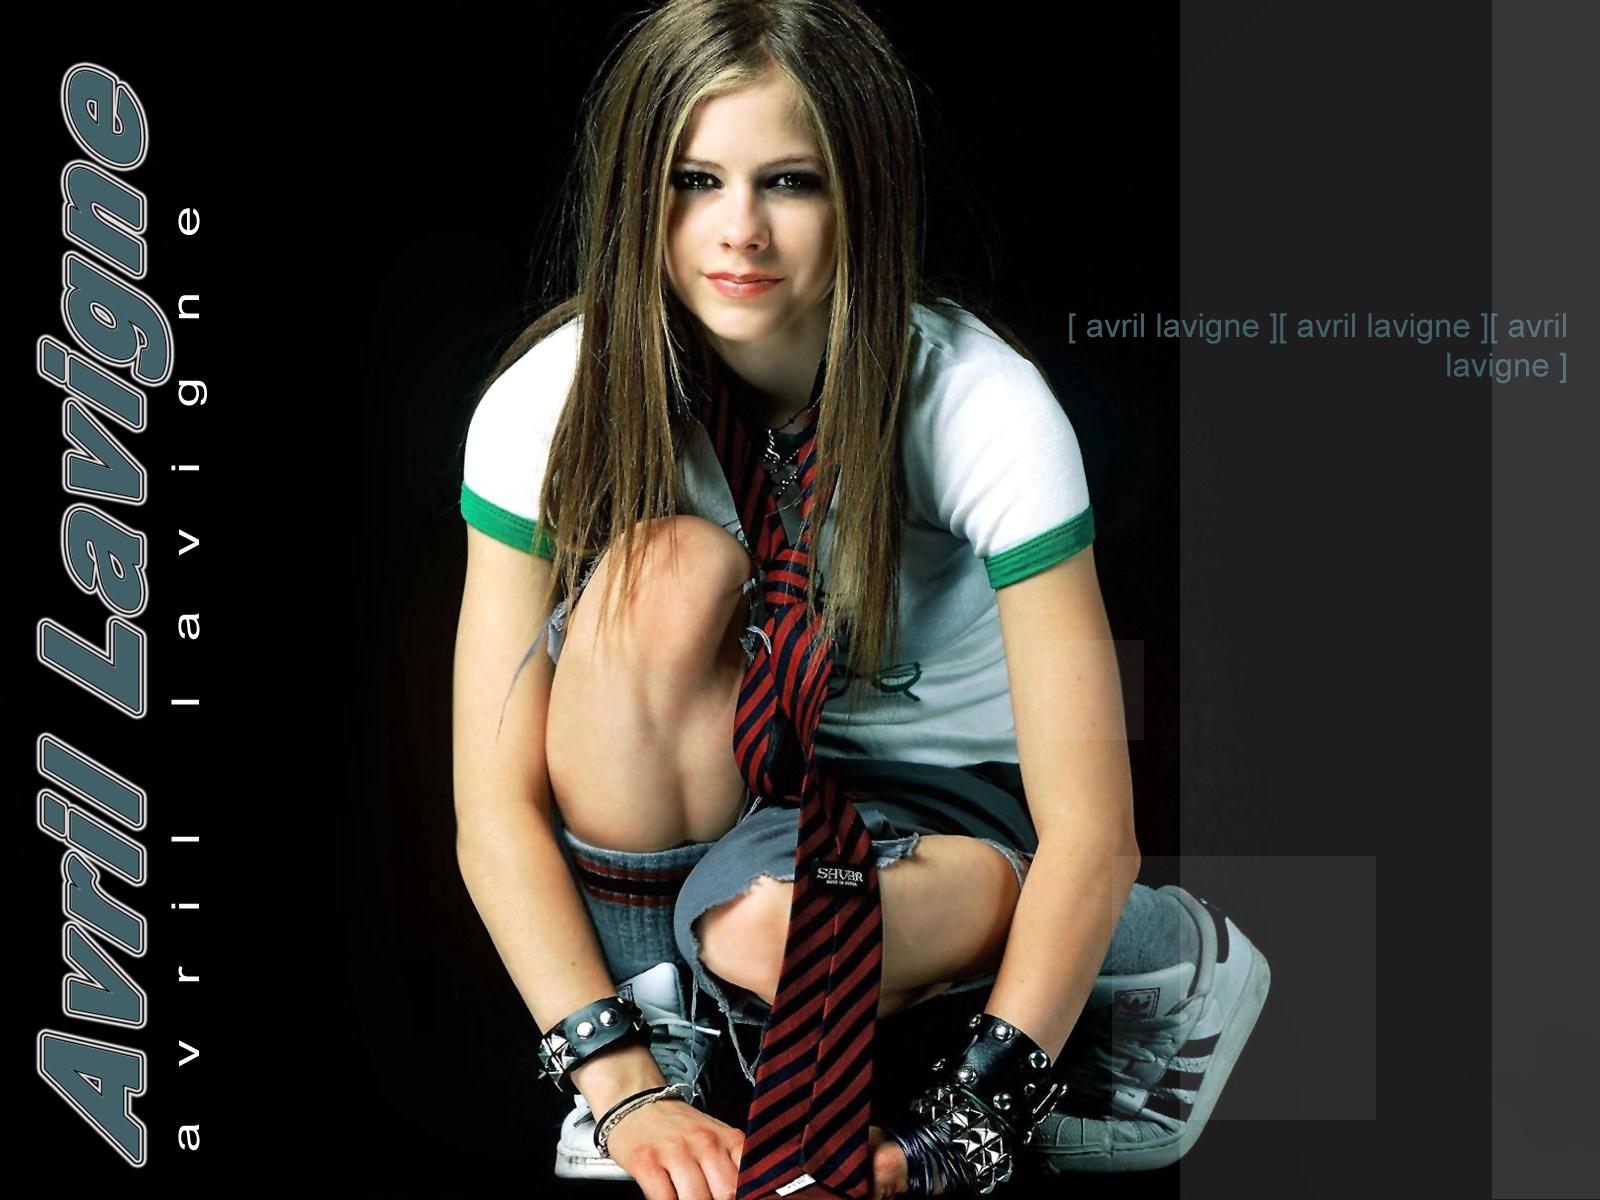 http://2.bp.blogspot.com/_ZRj5nlc3sp8/S97Z5Pu583I/AAAAAAAACa4/tuz2xFQ2seU/s1600/Avril+Lavigne+wallpapers+12.jpg